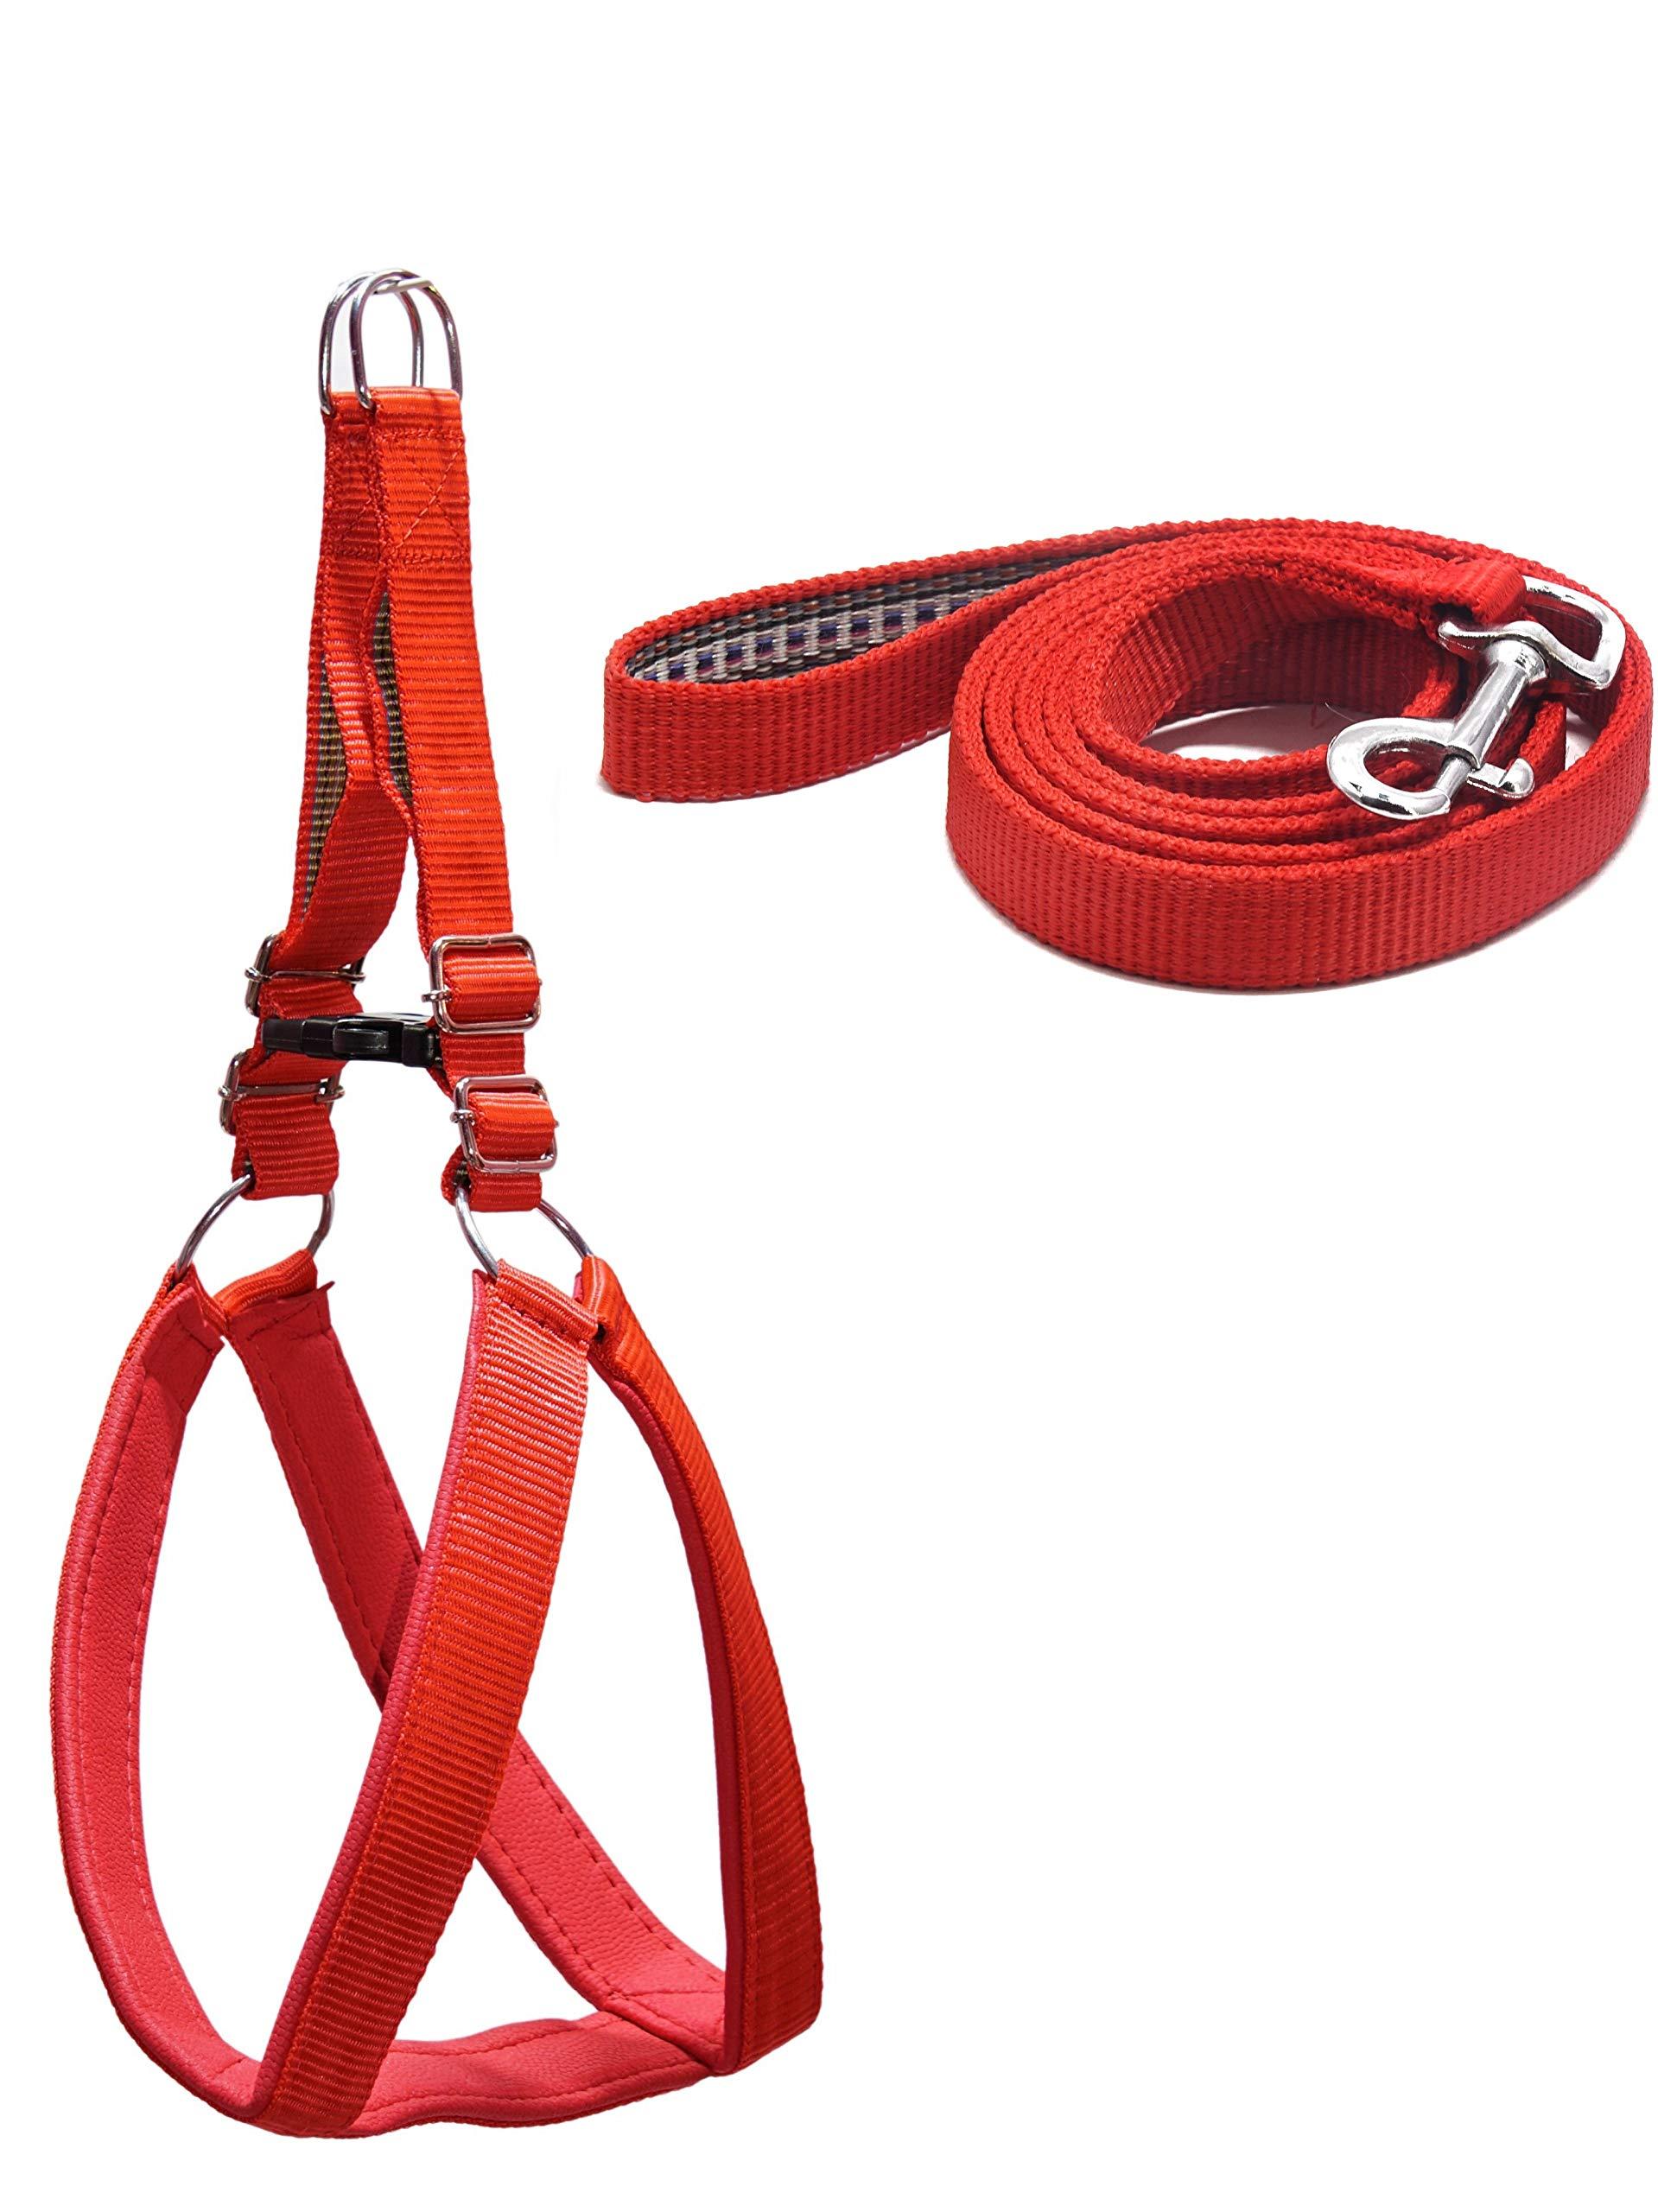 NimblFEET No Pull Nylon Adjustable Soft Padded Comfortable Pet Vest Harness and Leash Set Training Heavy Duty Vest for Dogs (Medium, Red)